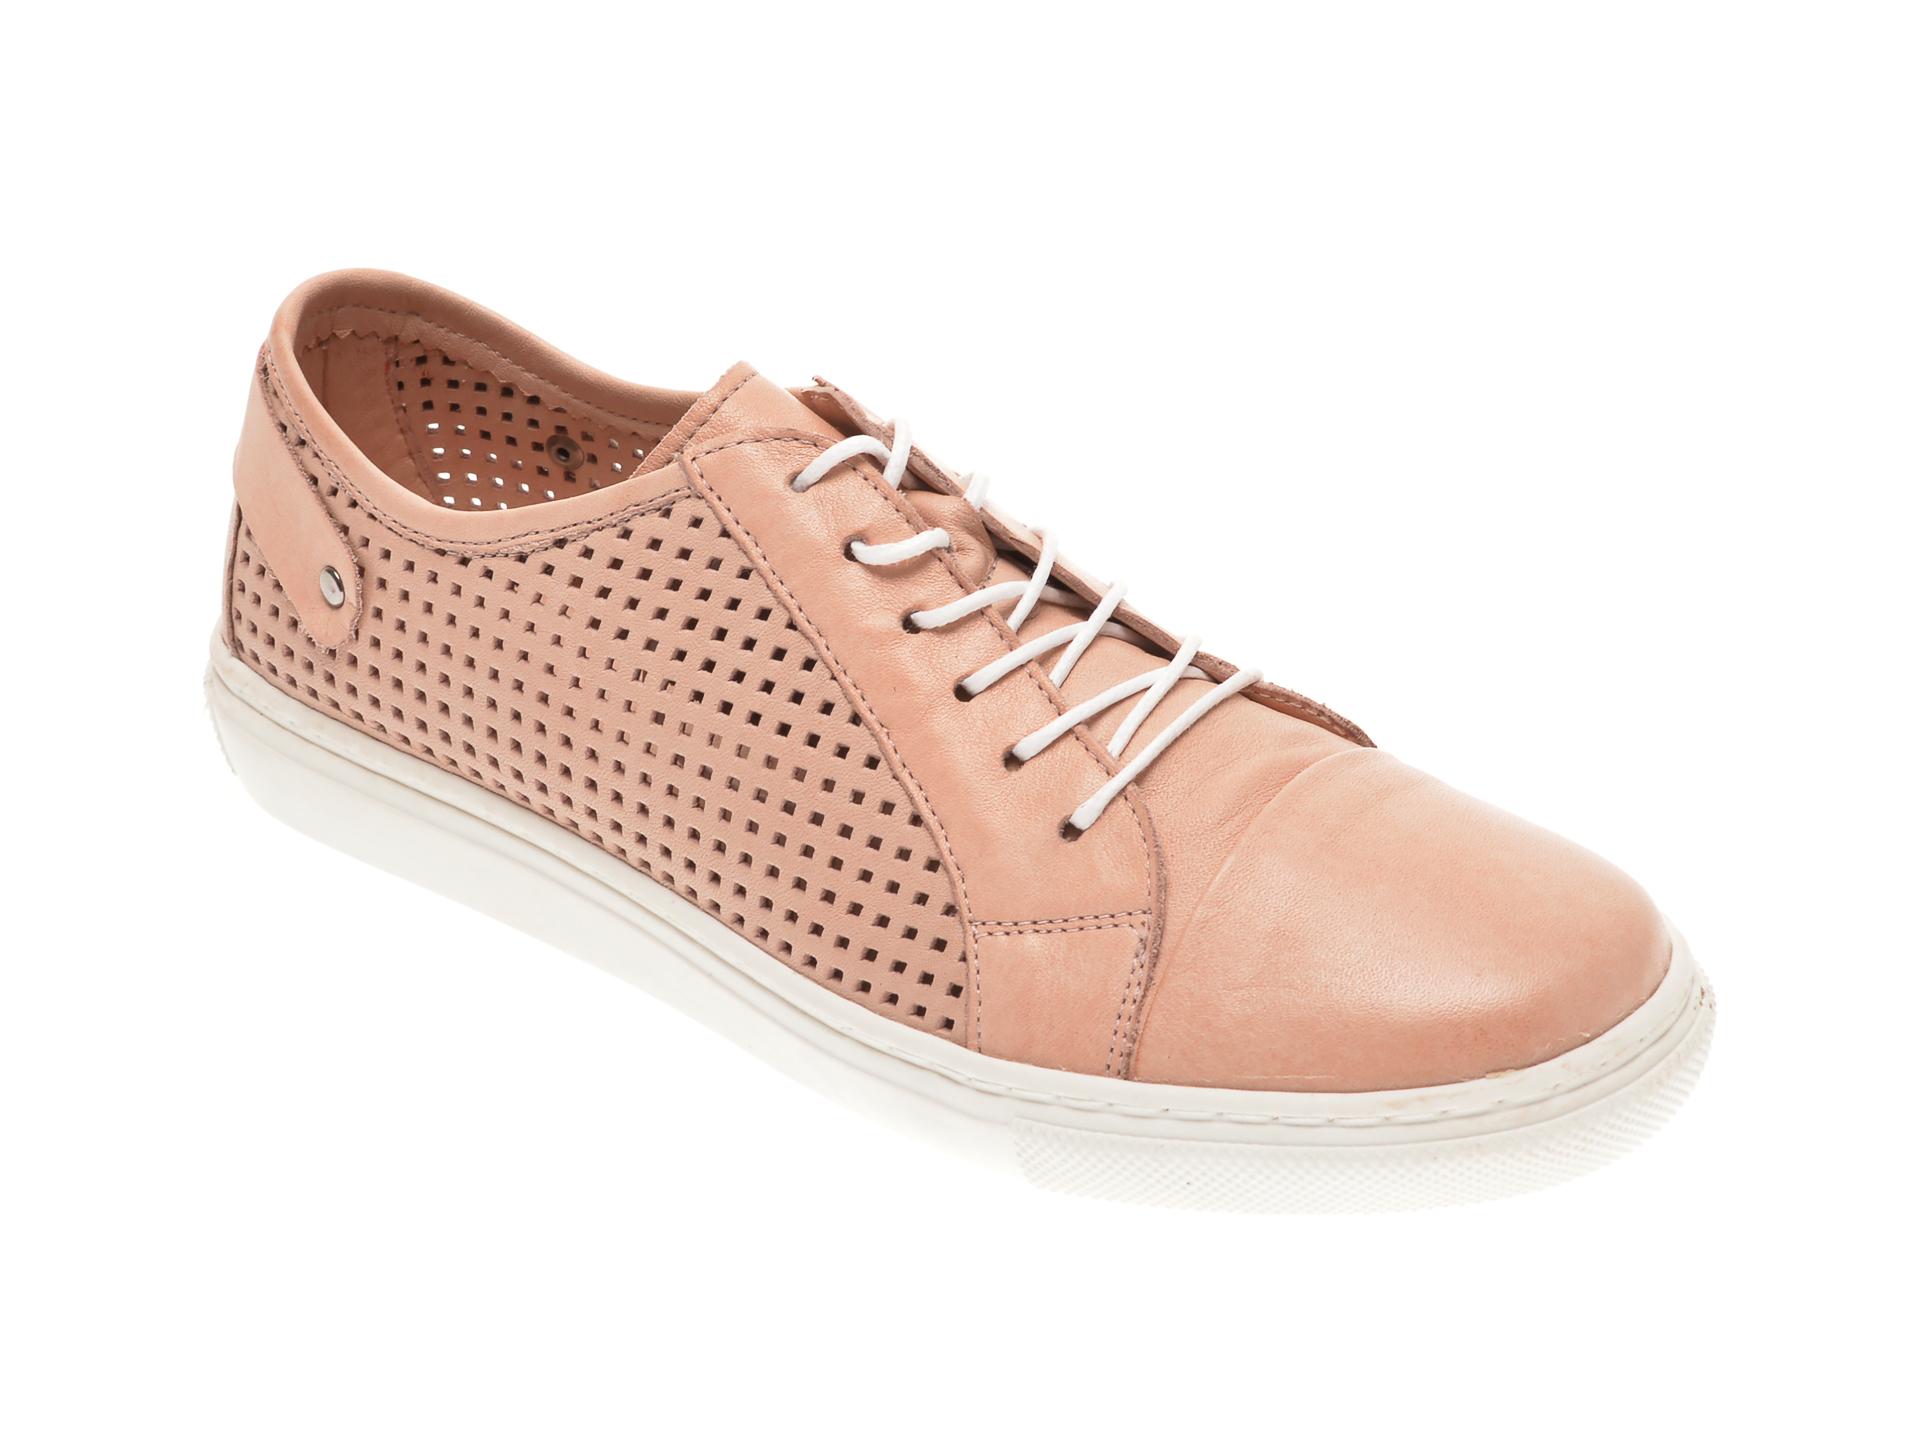 Pantofi BABOOS nude, R12, din piele naturala